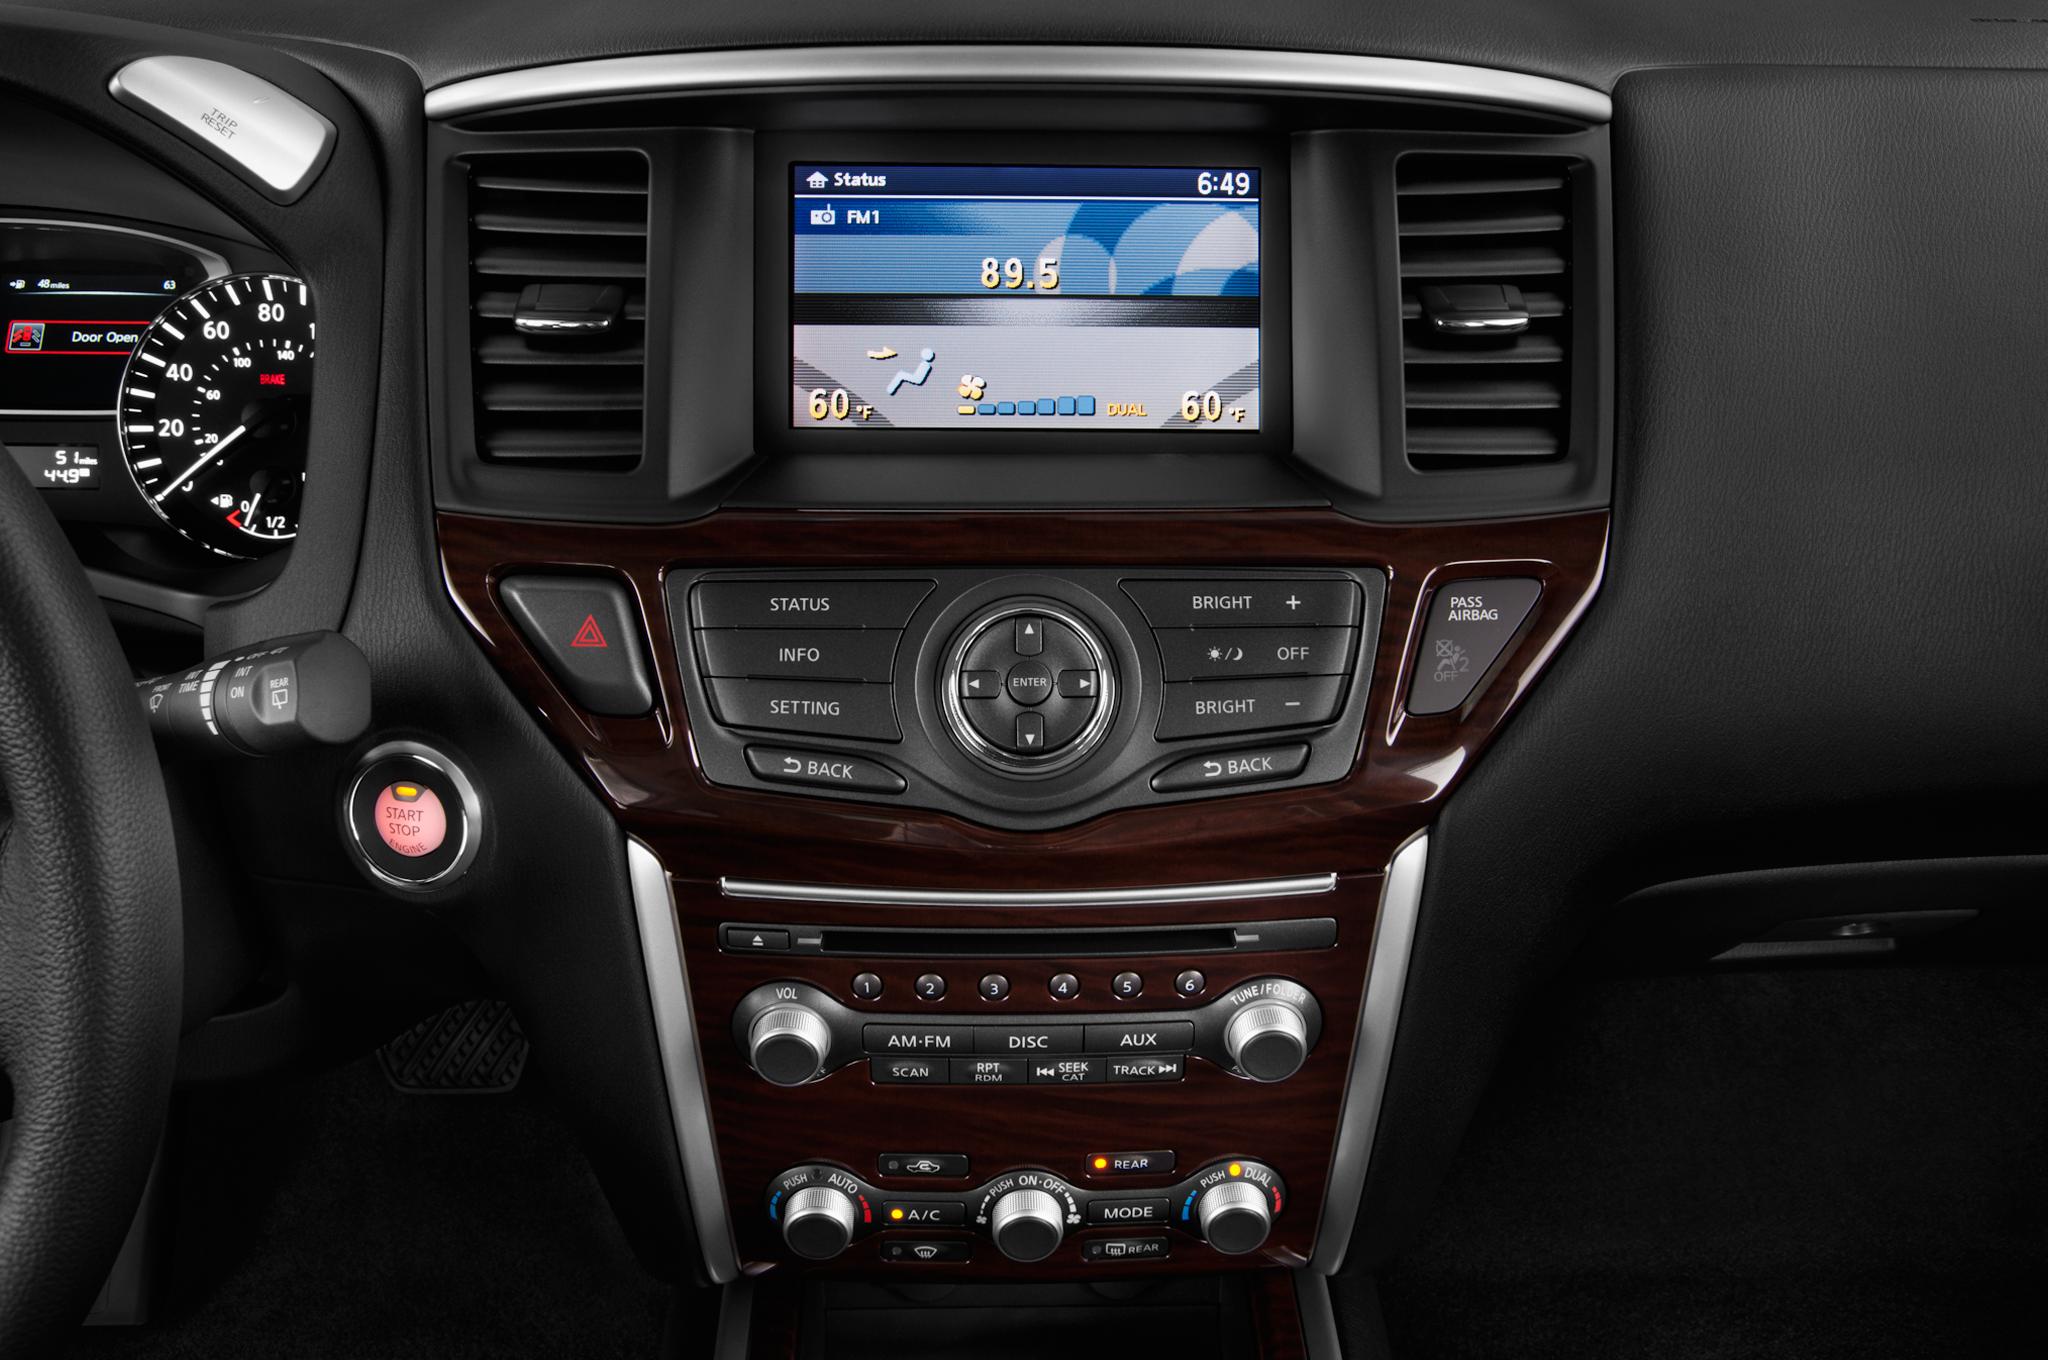 2011 nissan pathfinder stereo upgrade